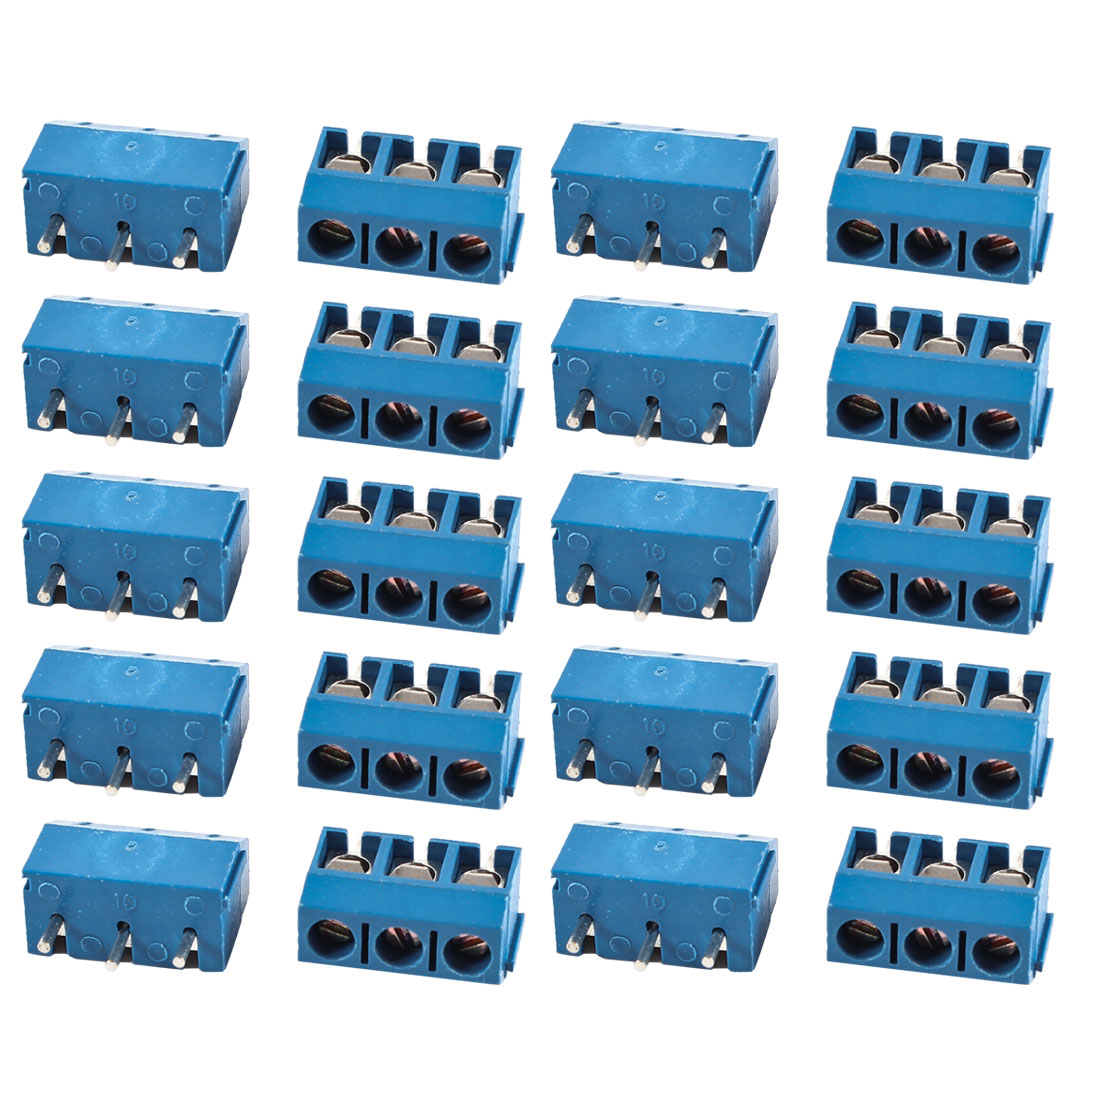 20 Pcs Blue KF301-3P 3 Position 5mm Pitch PCB Mount Screw Terminal Block Connectors 300V 16A